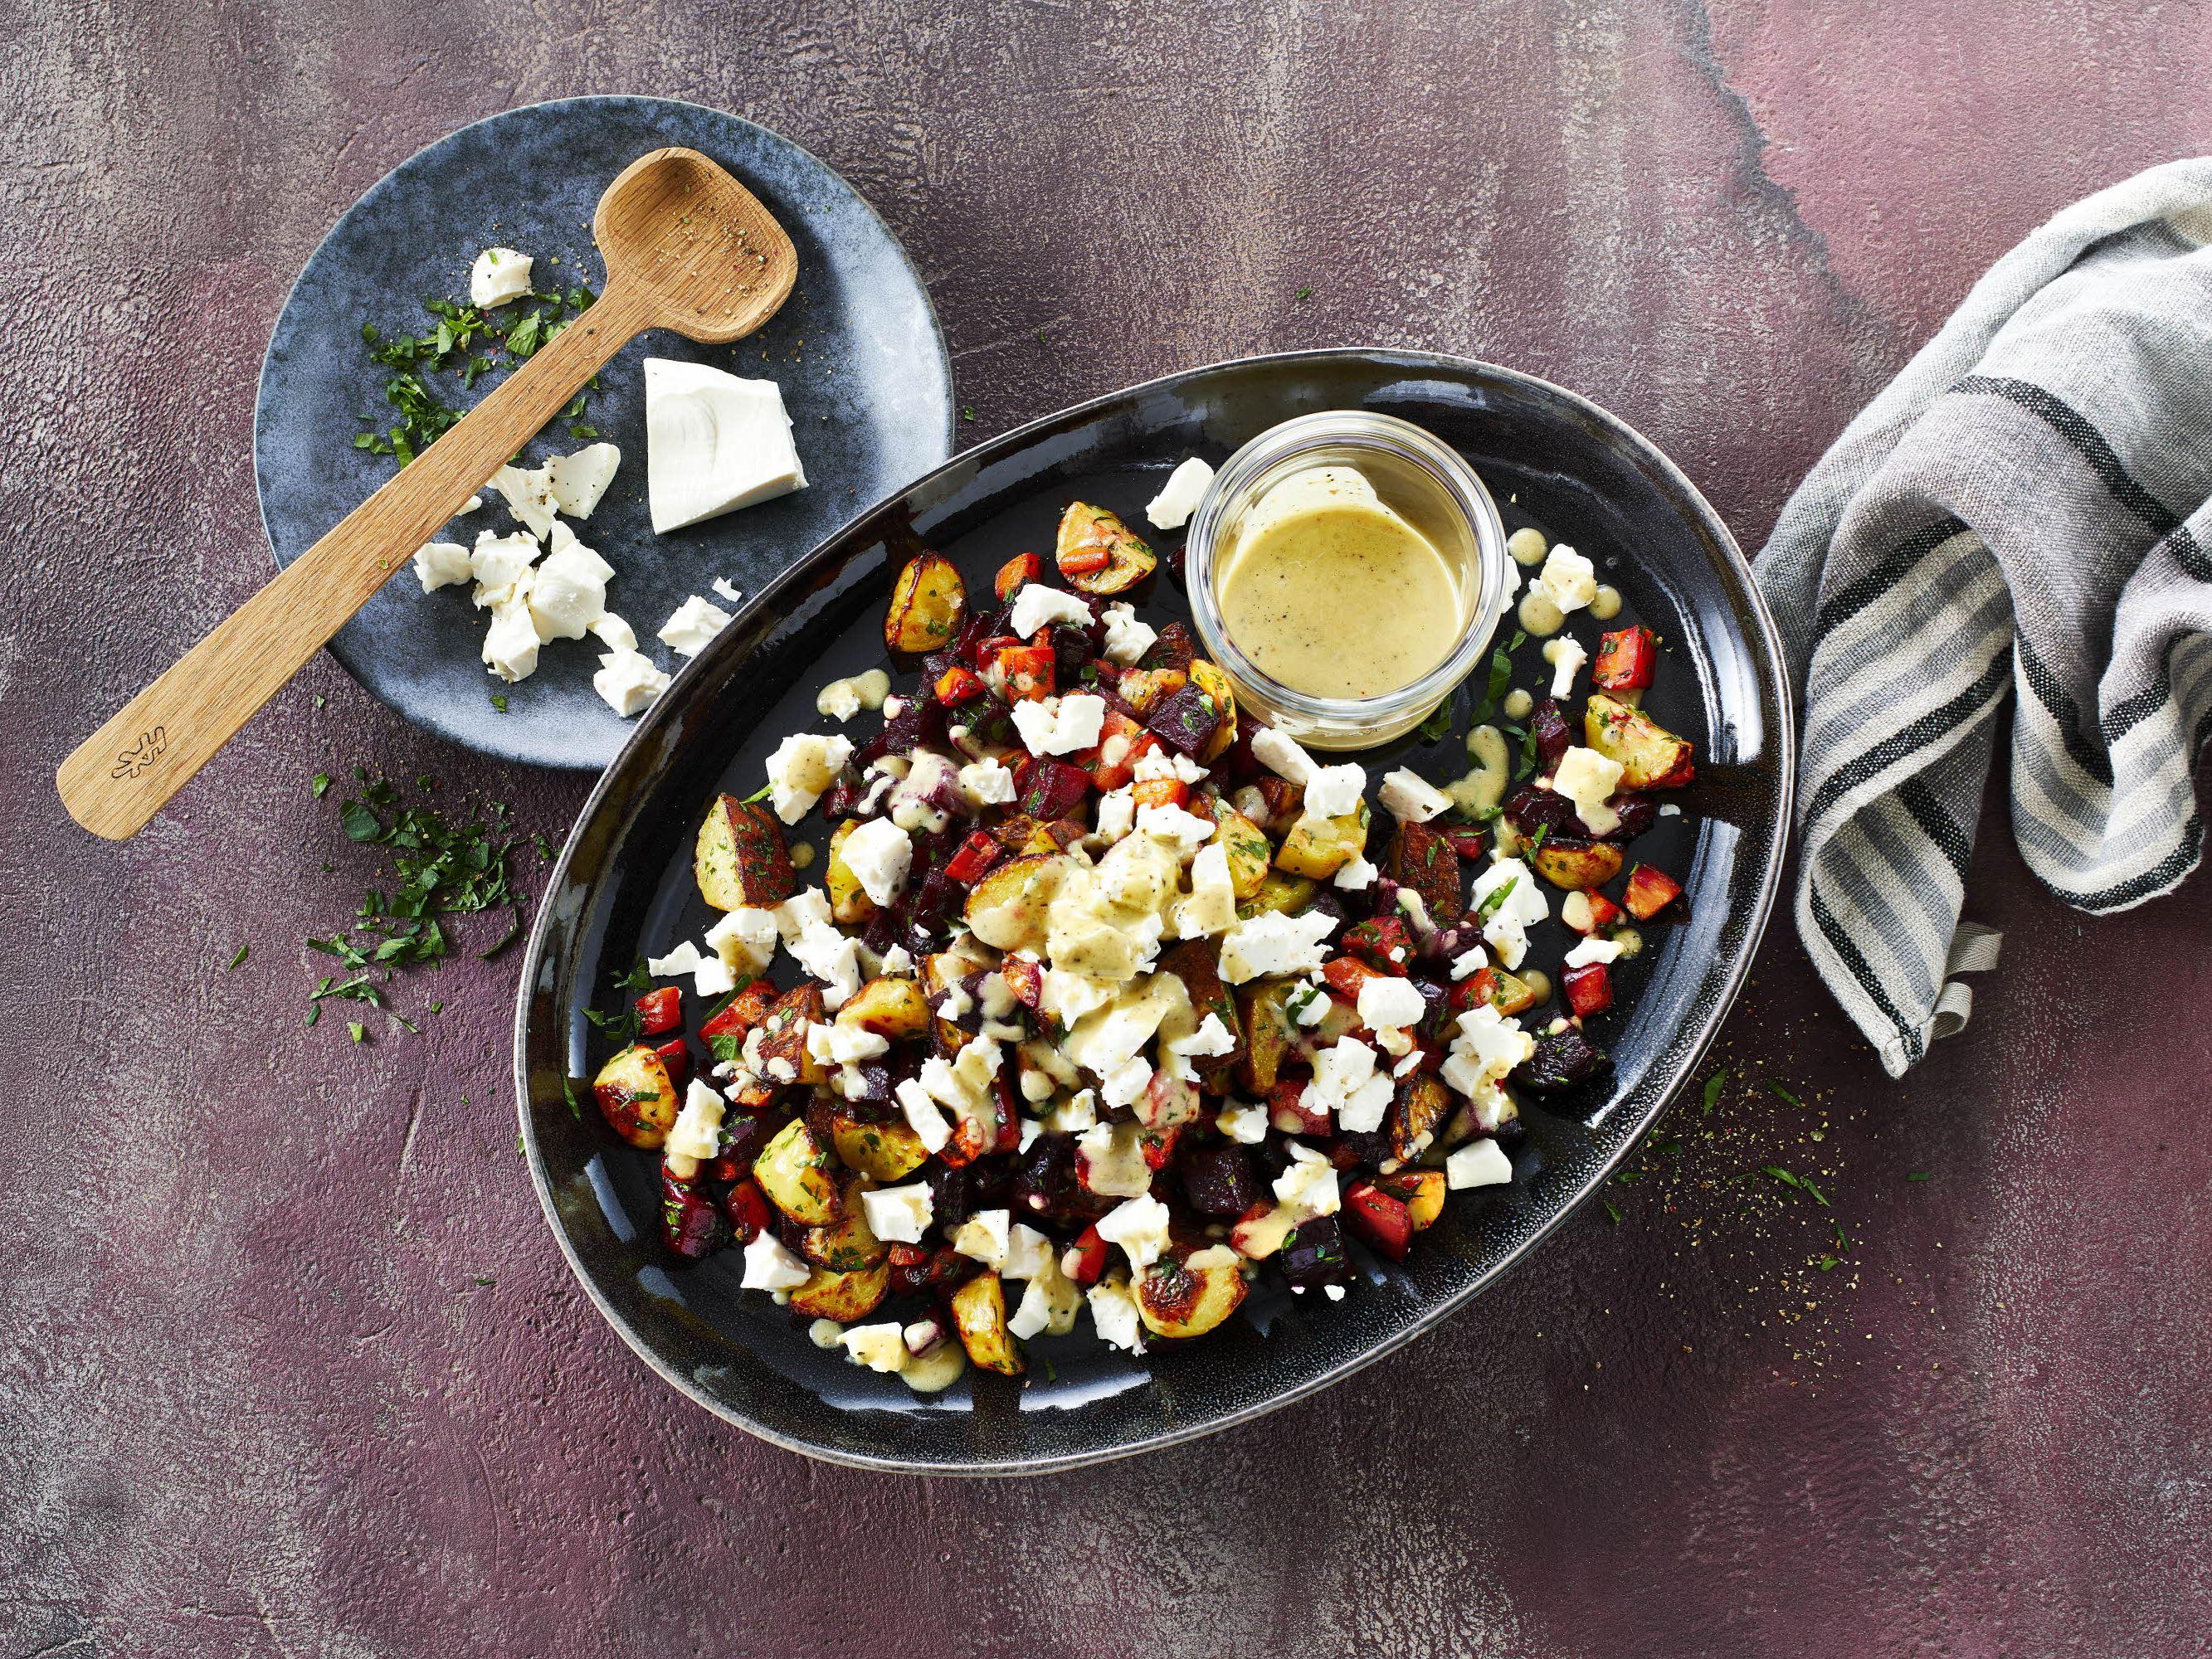 Bagt rodfrugtsalat med queso fresco